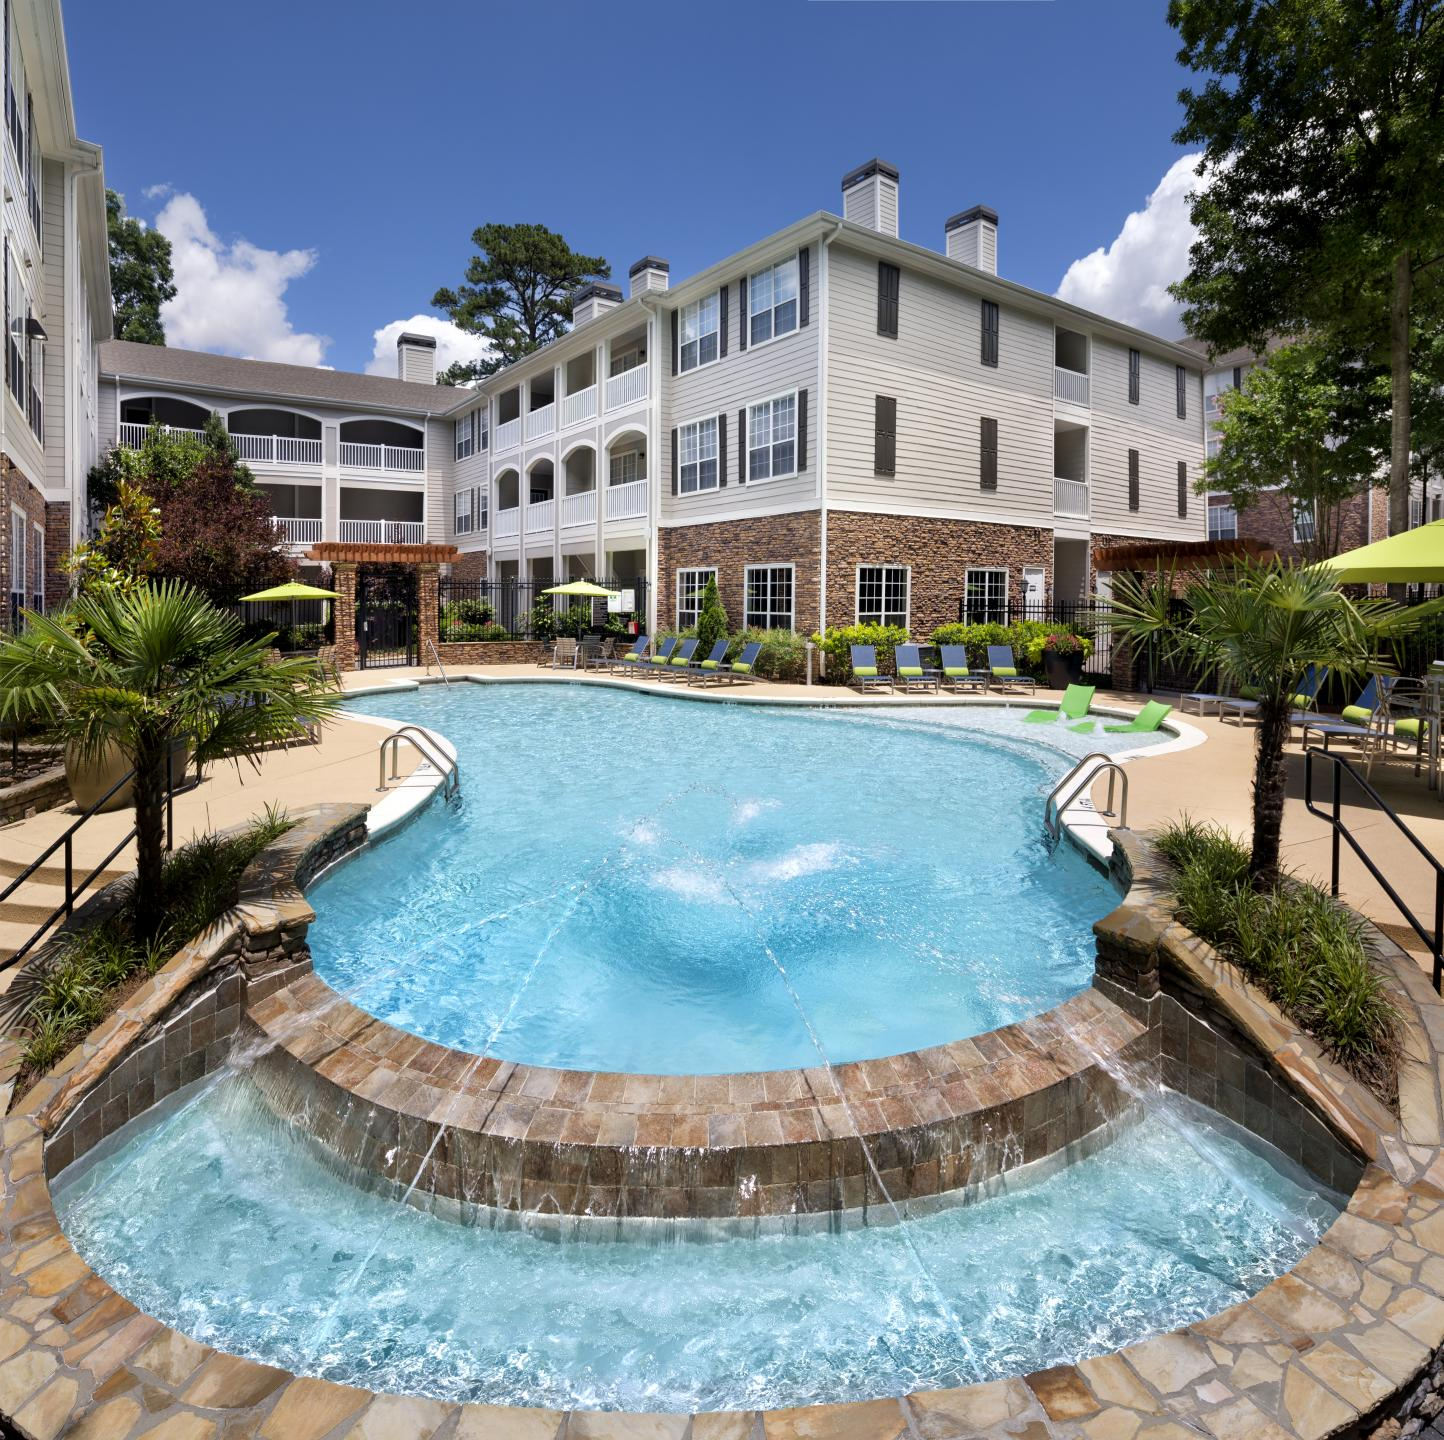 Camden Creekstone Apartments image 10